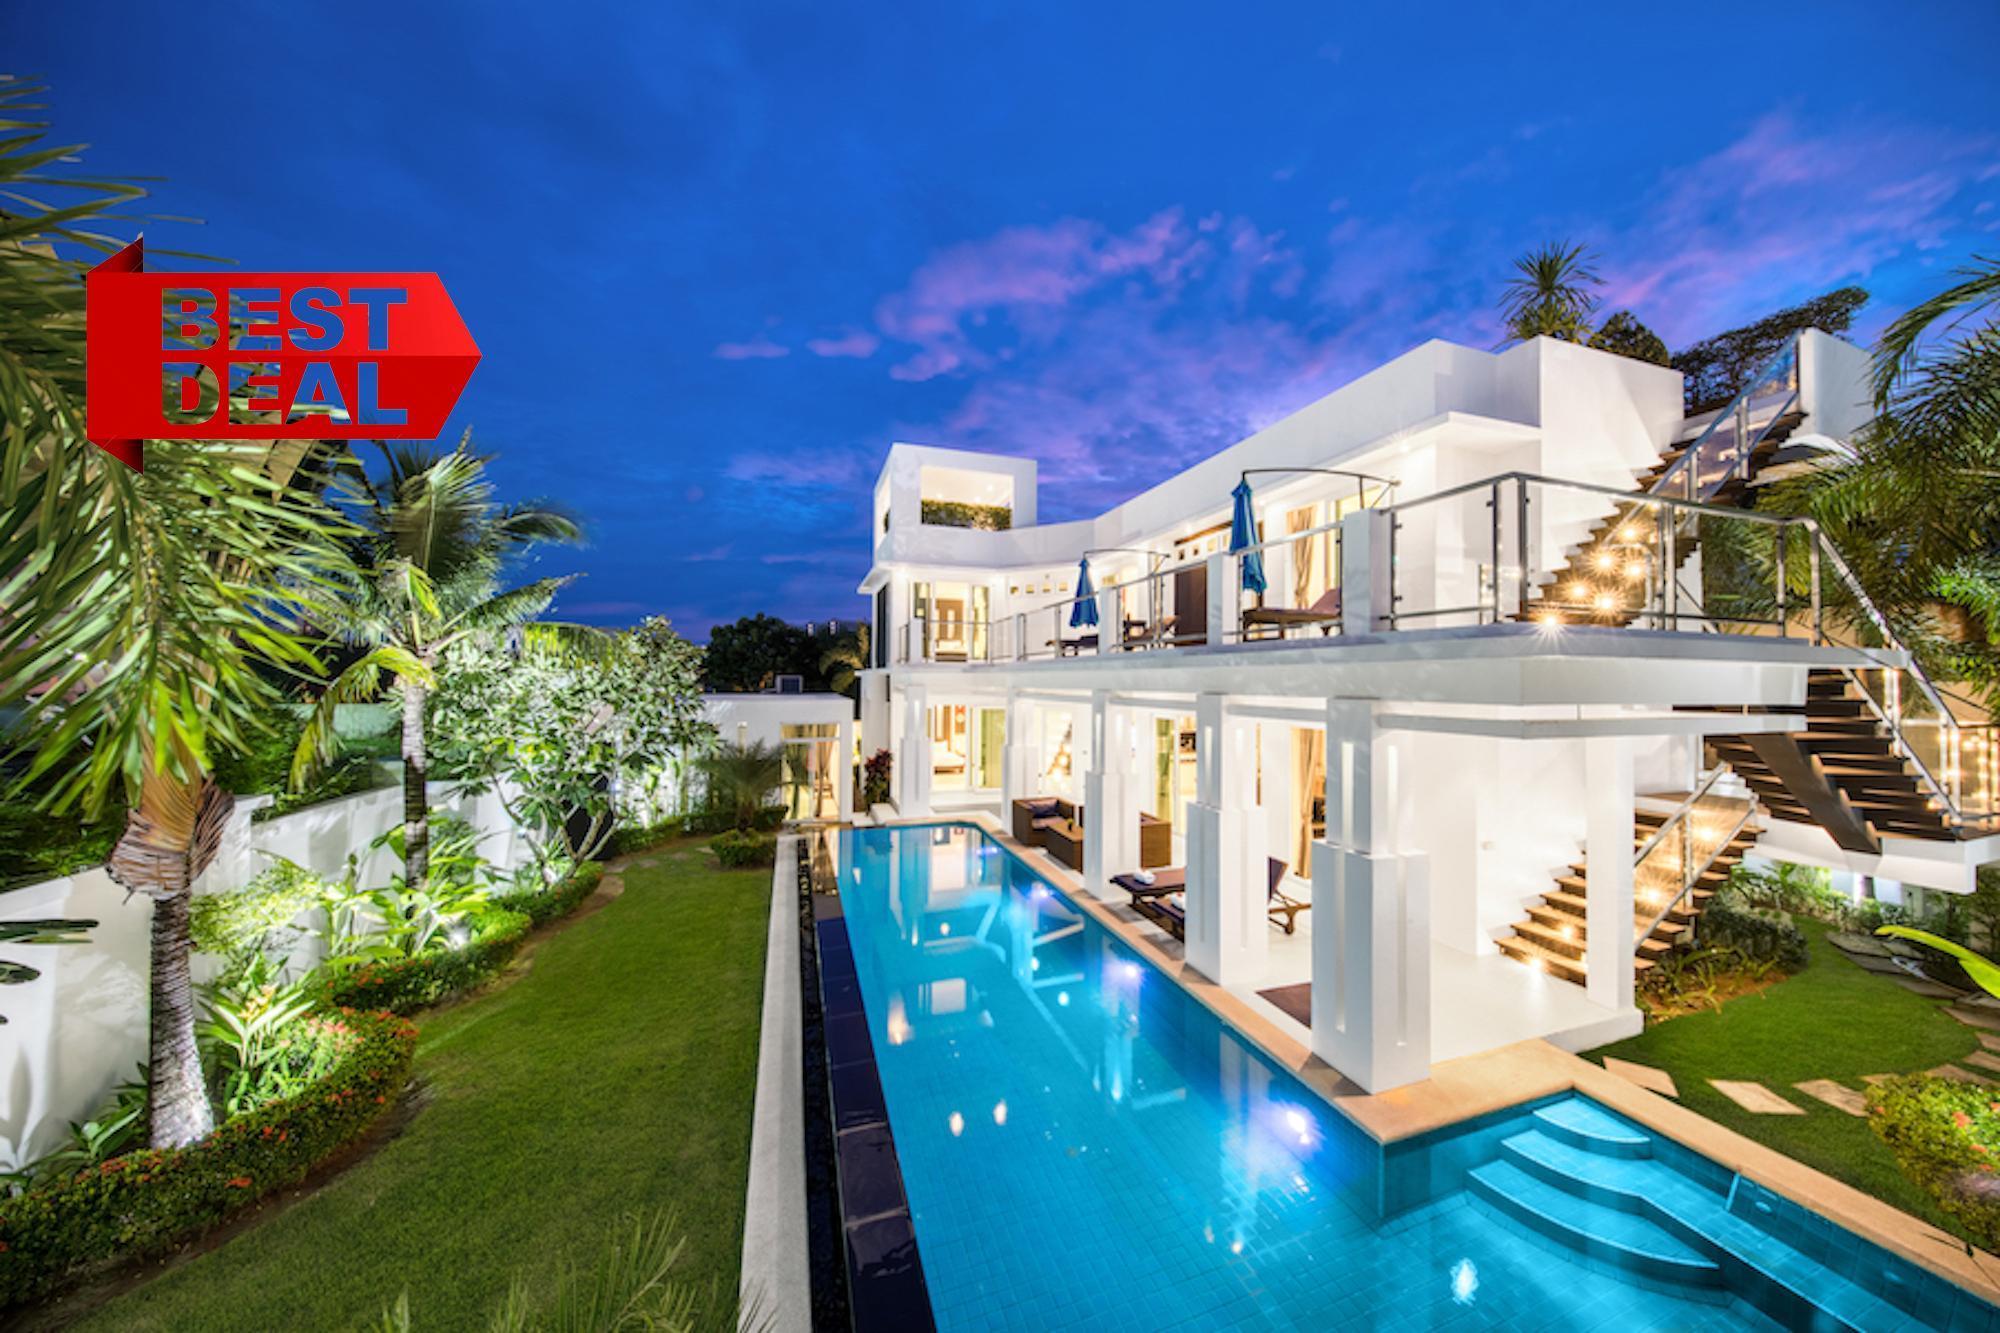 PREMIUM Pool Villa Pattaya 5 Bedroom With Jacuzzi